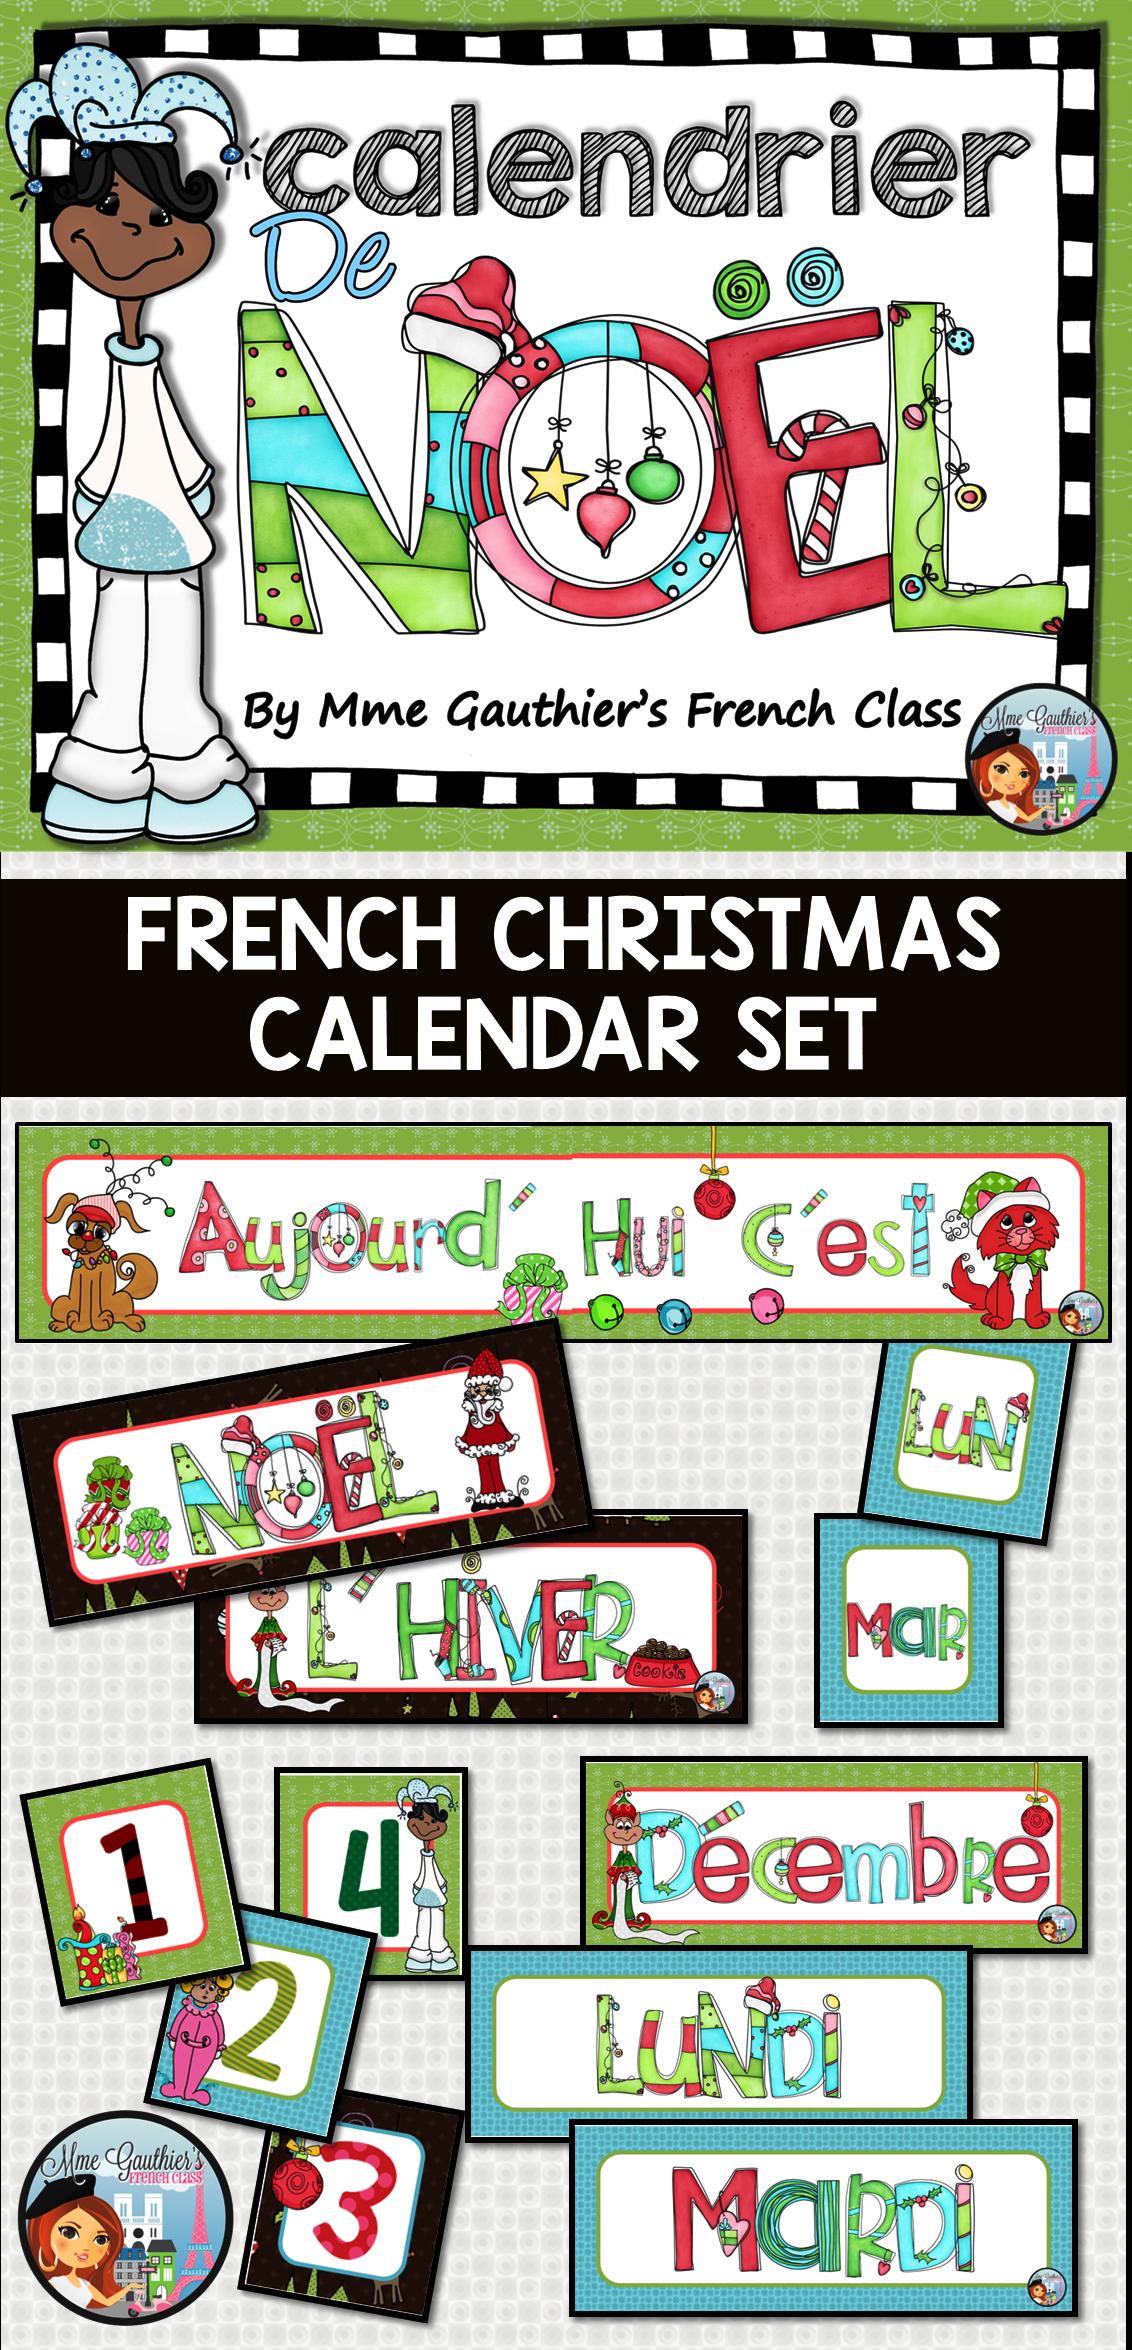 French Christmas Calendar Set